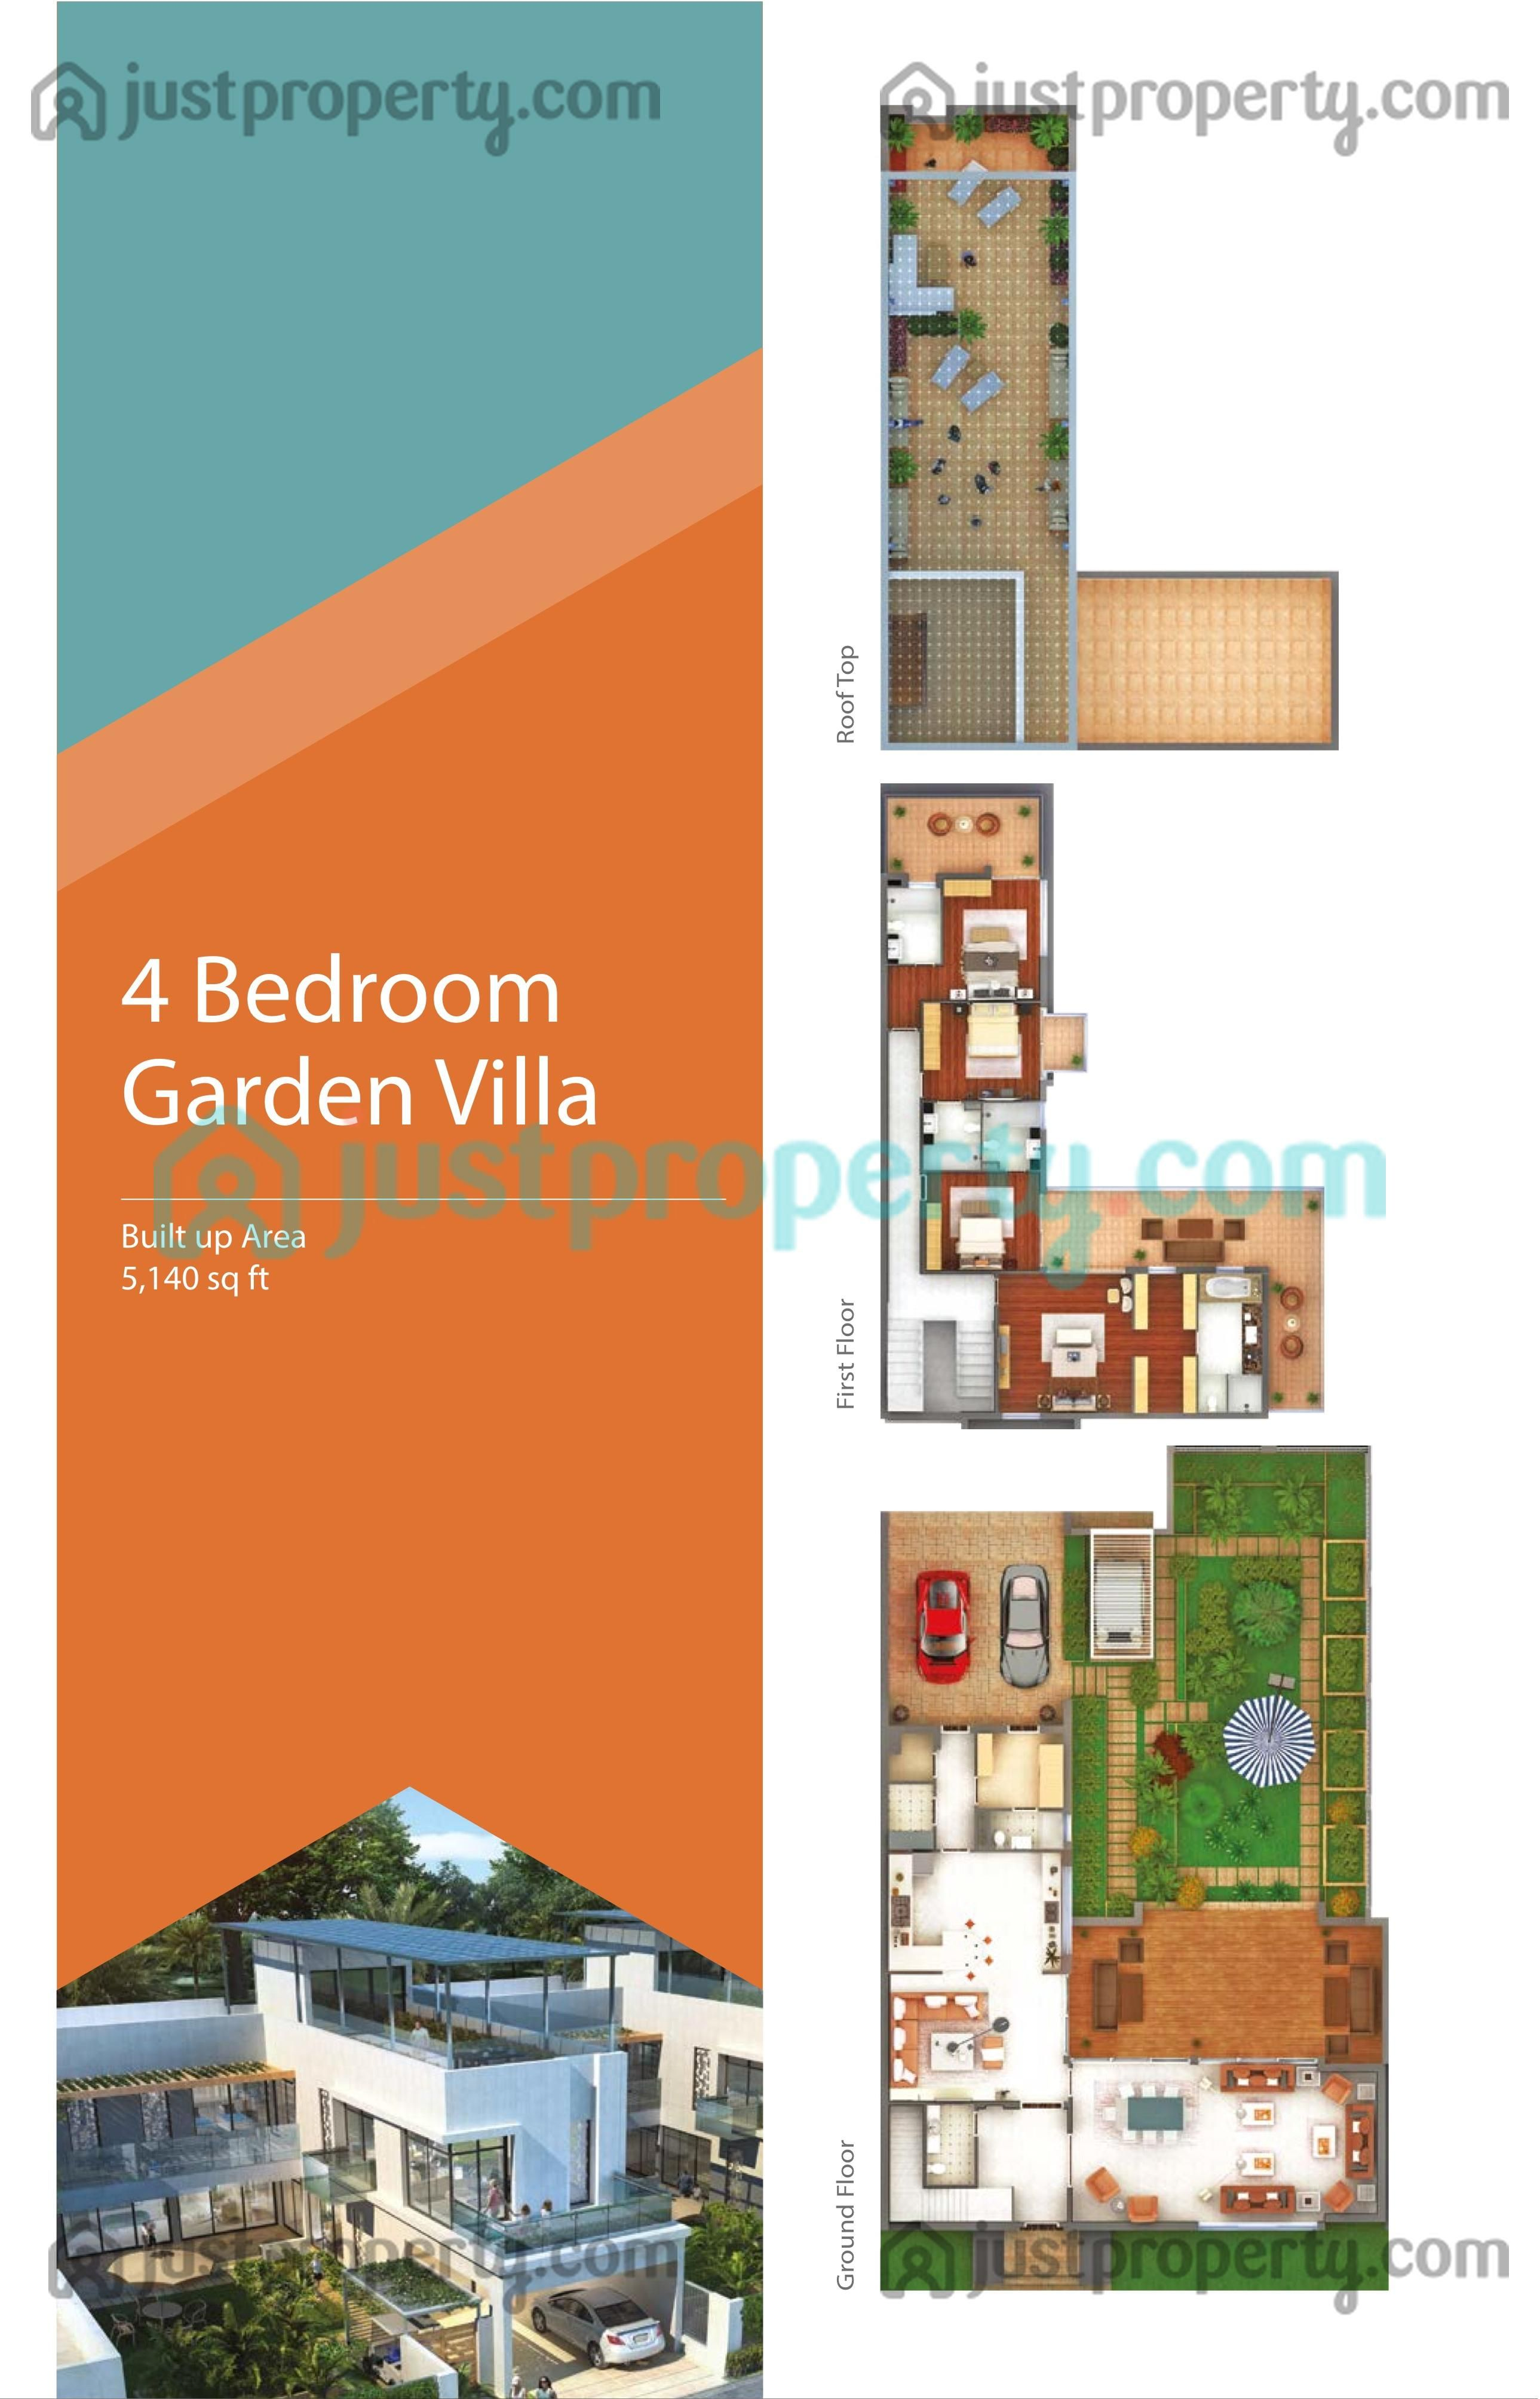 Dubai Sustainable City Floor Plans Justproperty Com Sustainable City Floor Plans Building